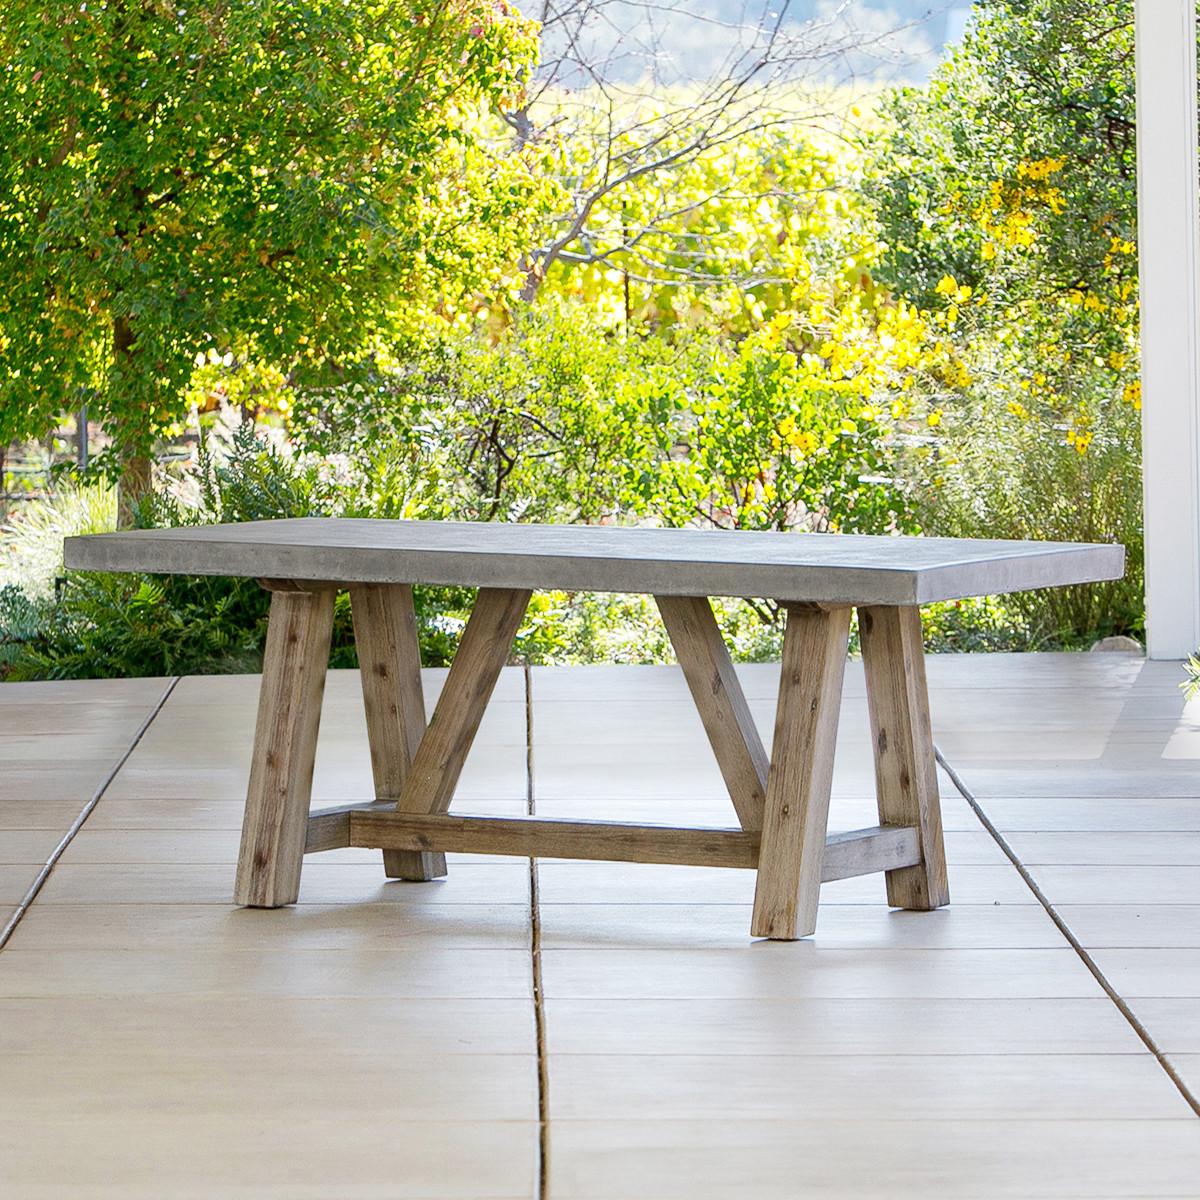 Best ideas about Concrete Patio Table . Save or Pin Bordeaux Concrete Top Table Outdoor Furniture Now.